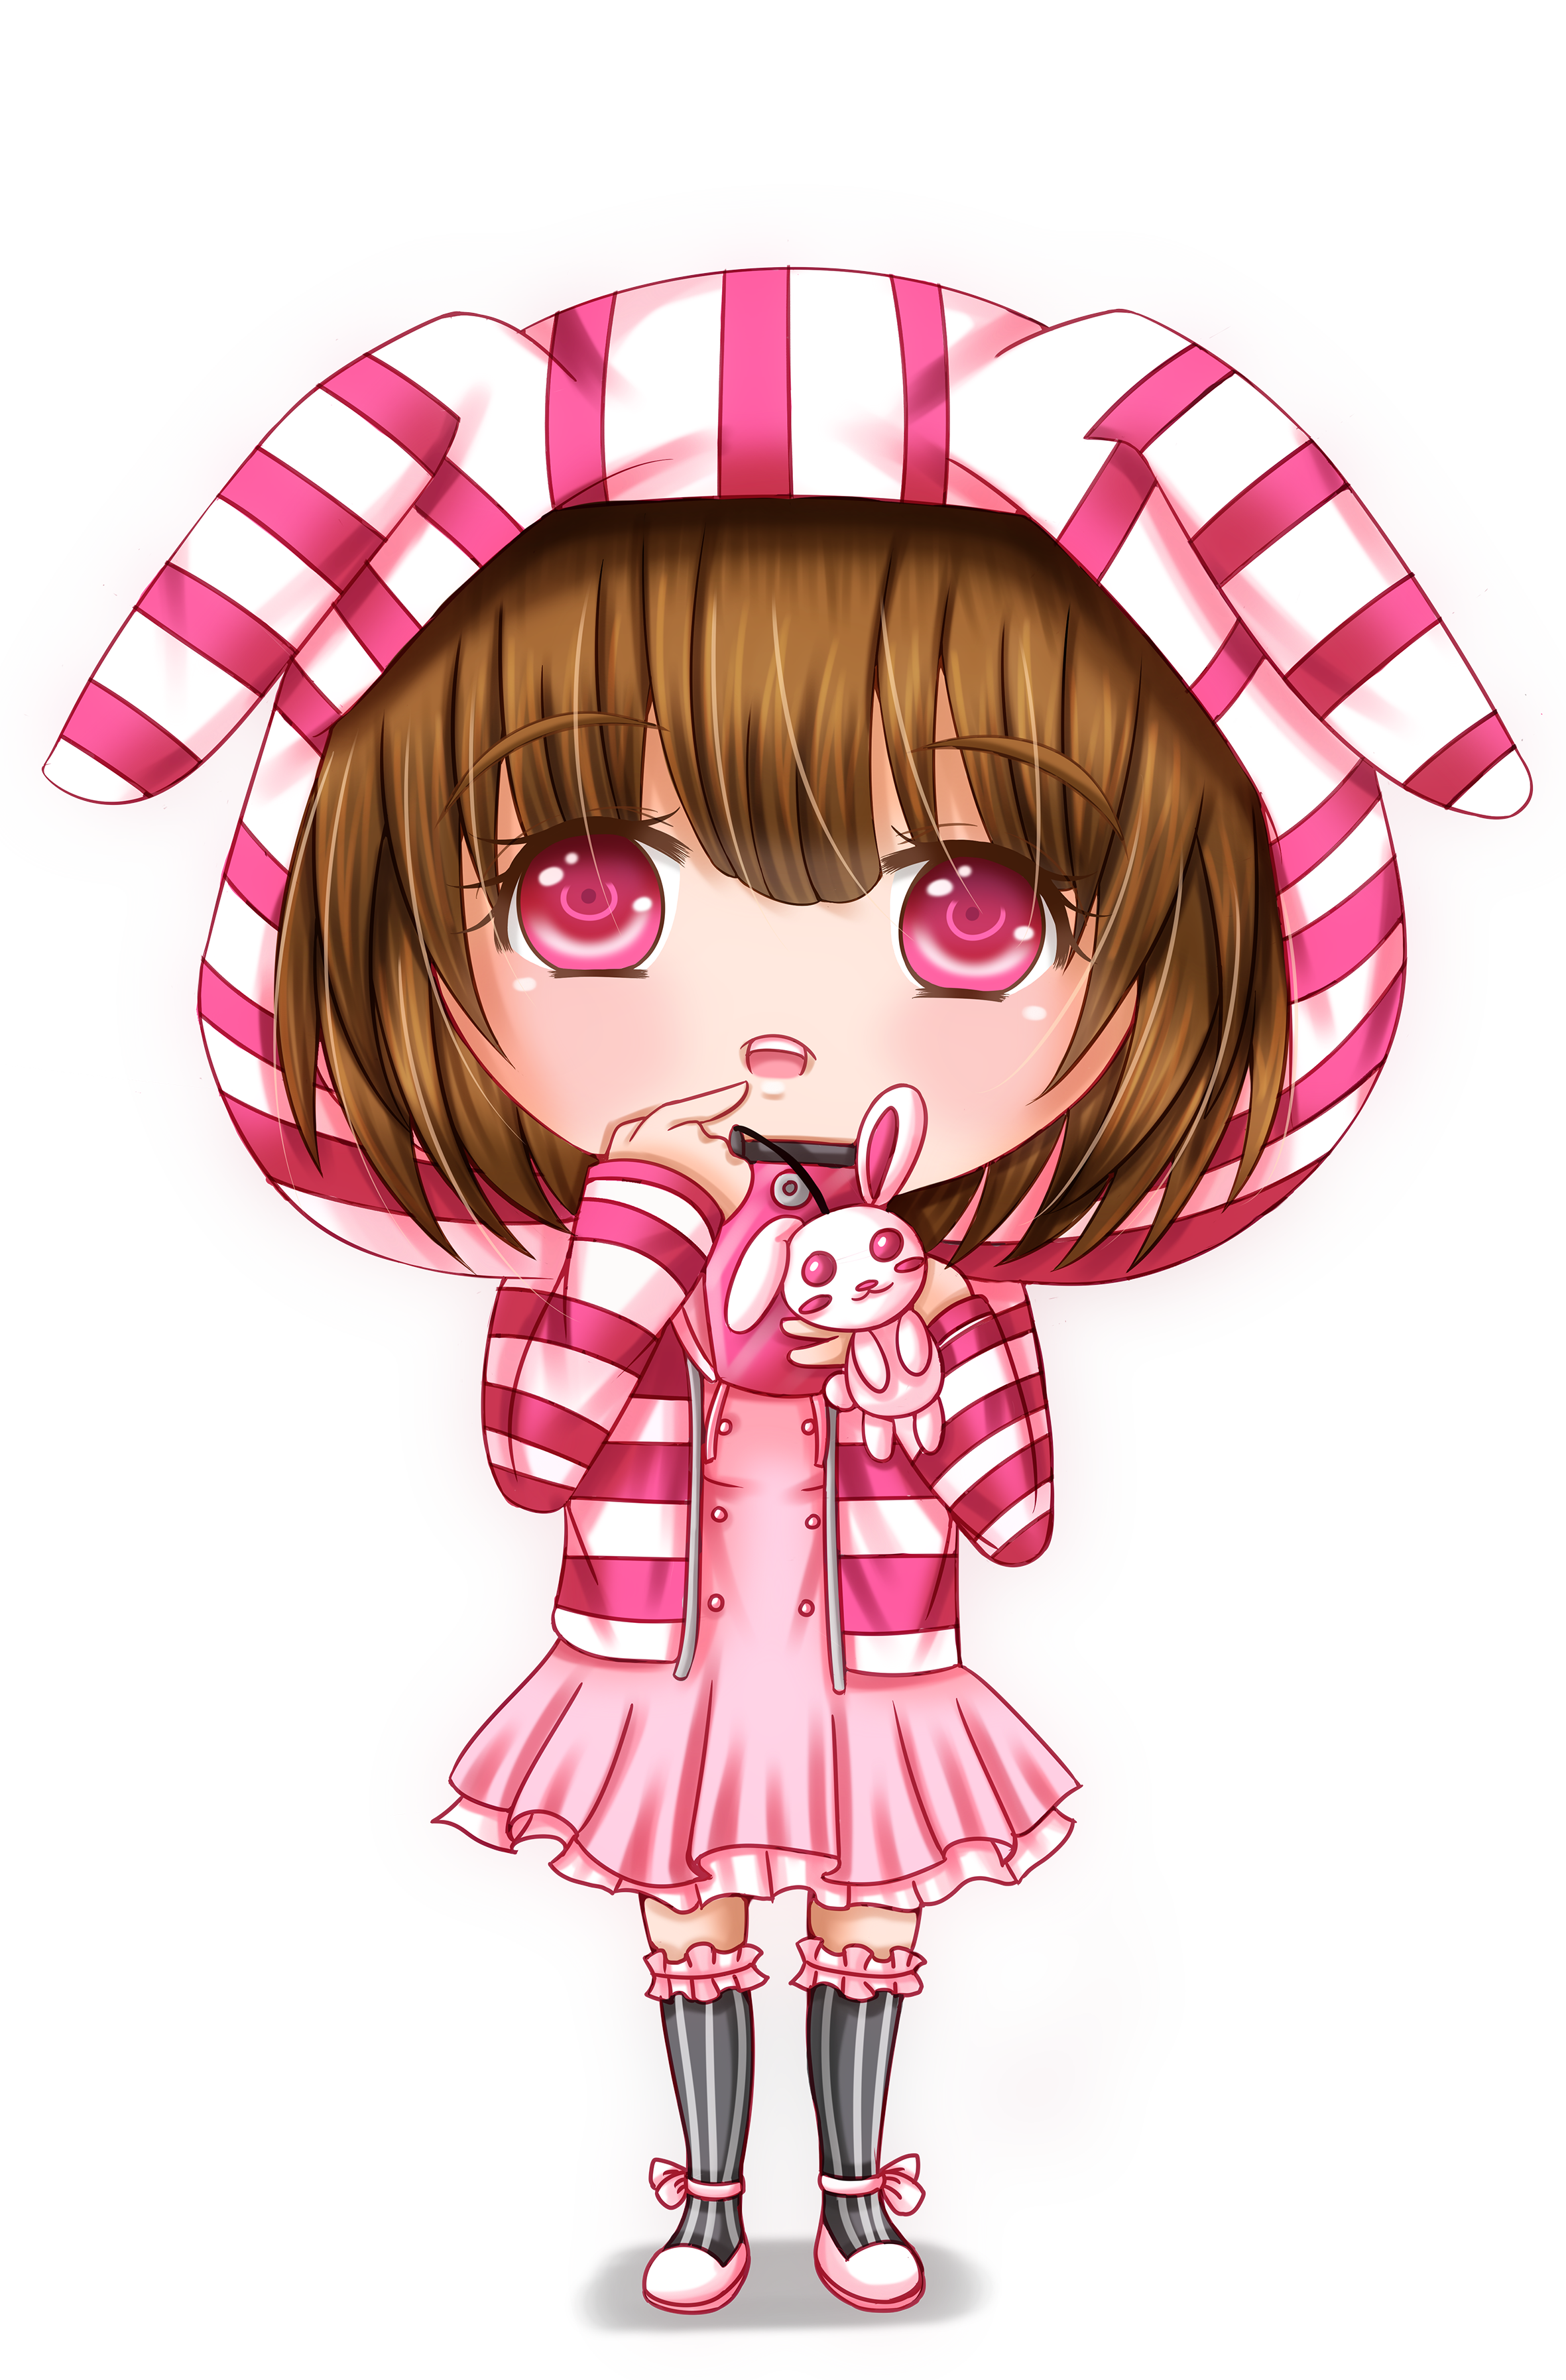 Yoyo - Kiyomi Party Girl